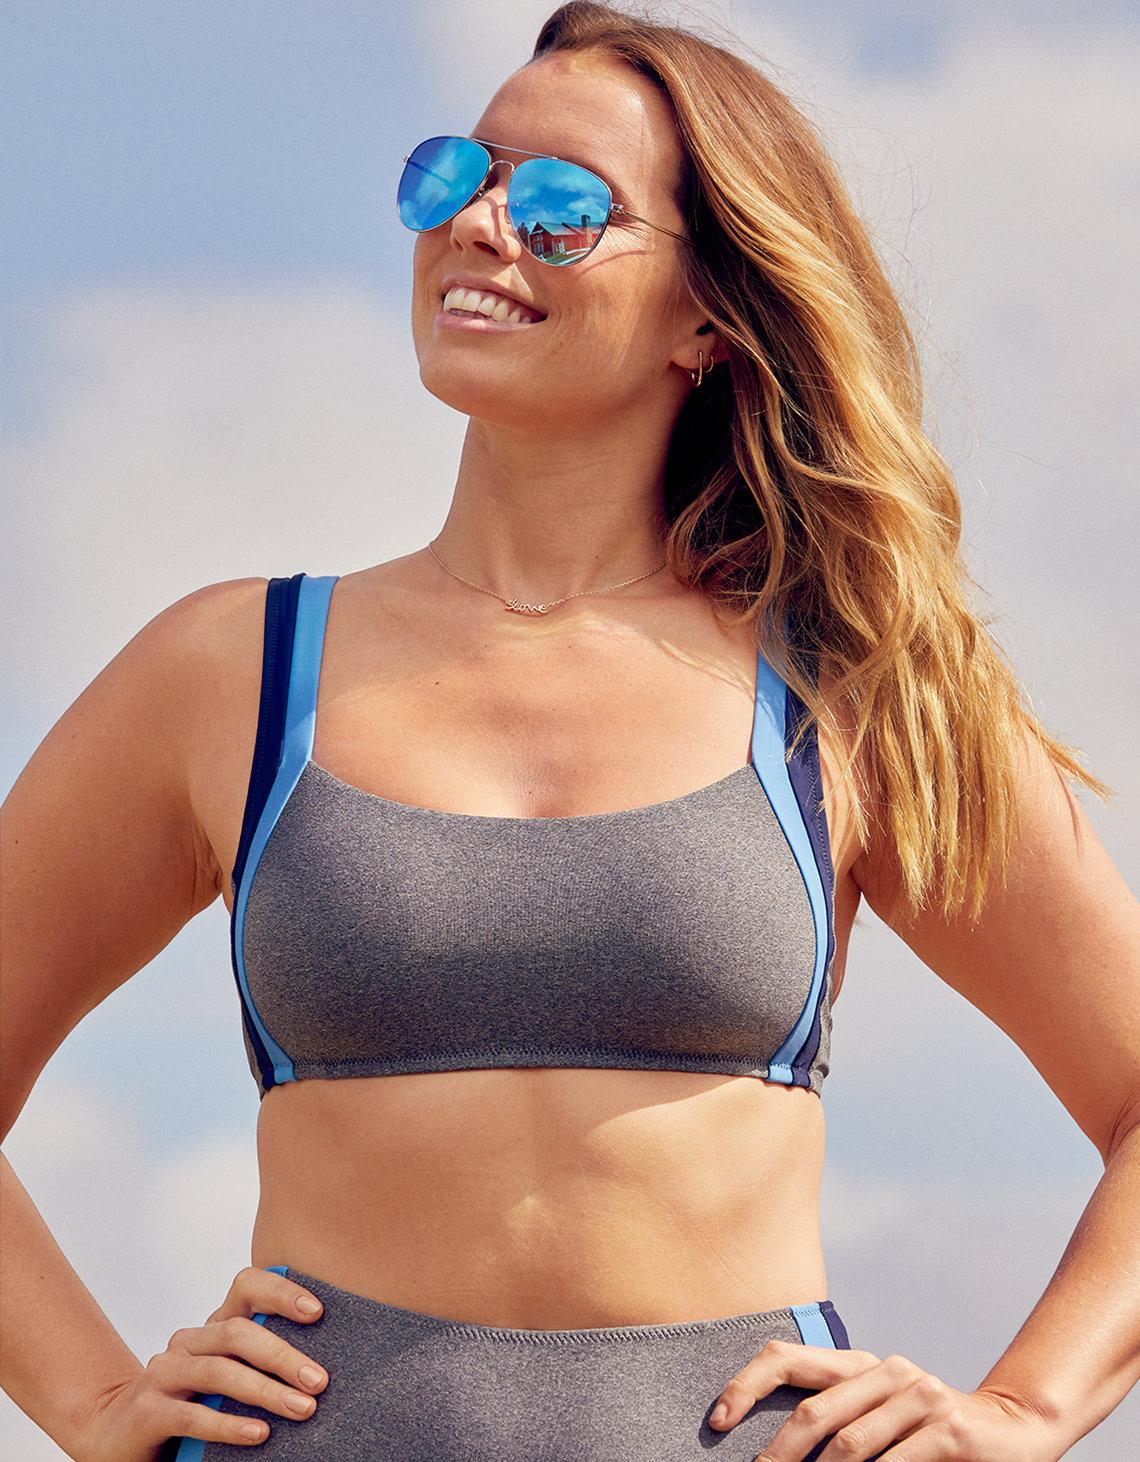 d8c0f377becf1 Aerie Track Scoop Bikini Top, Heather Gray | Aerie for American Eagle